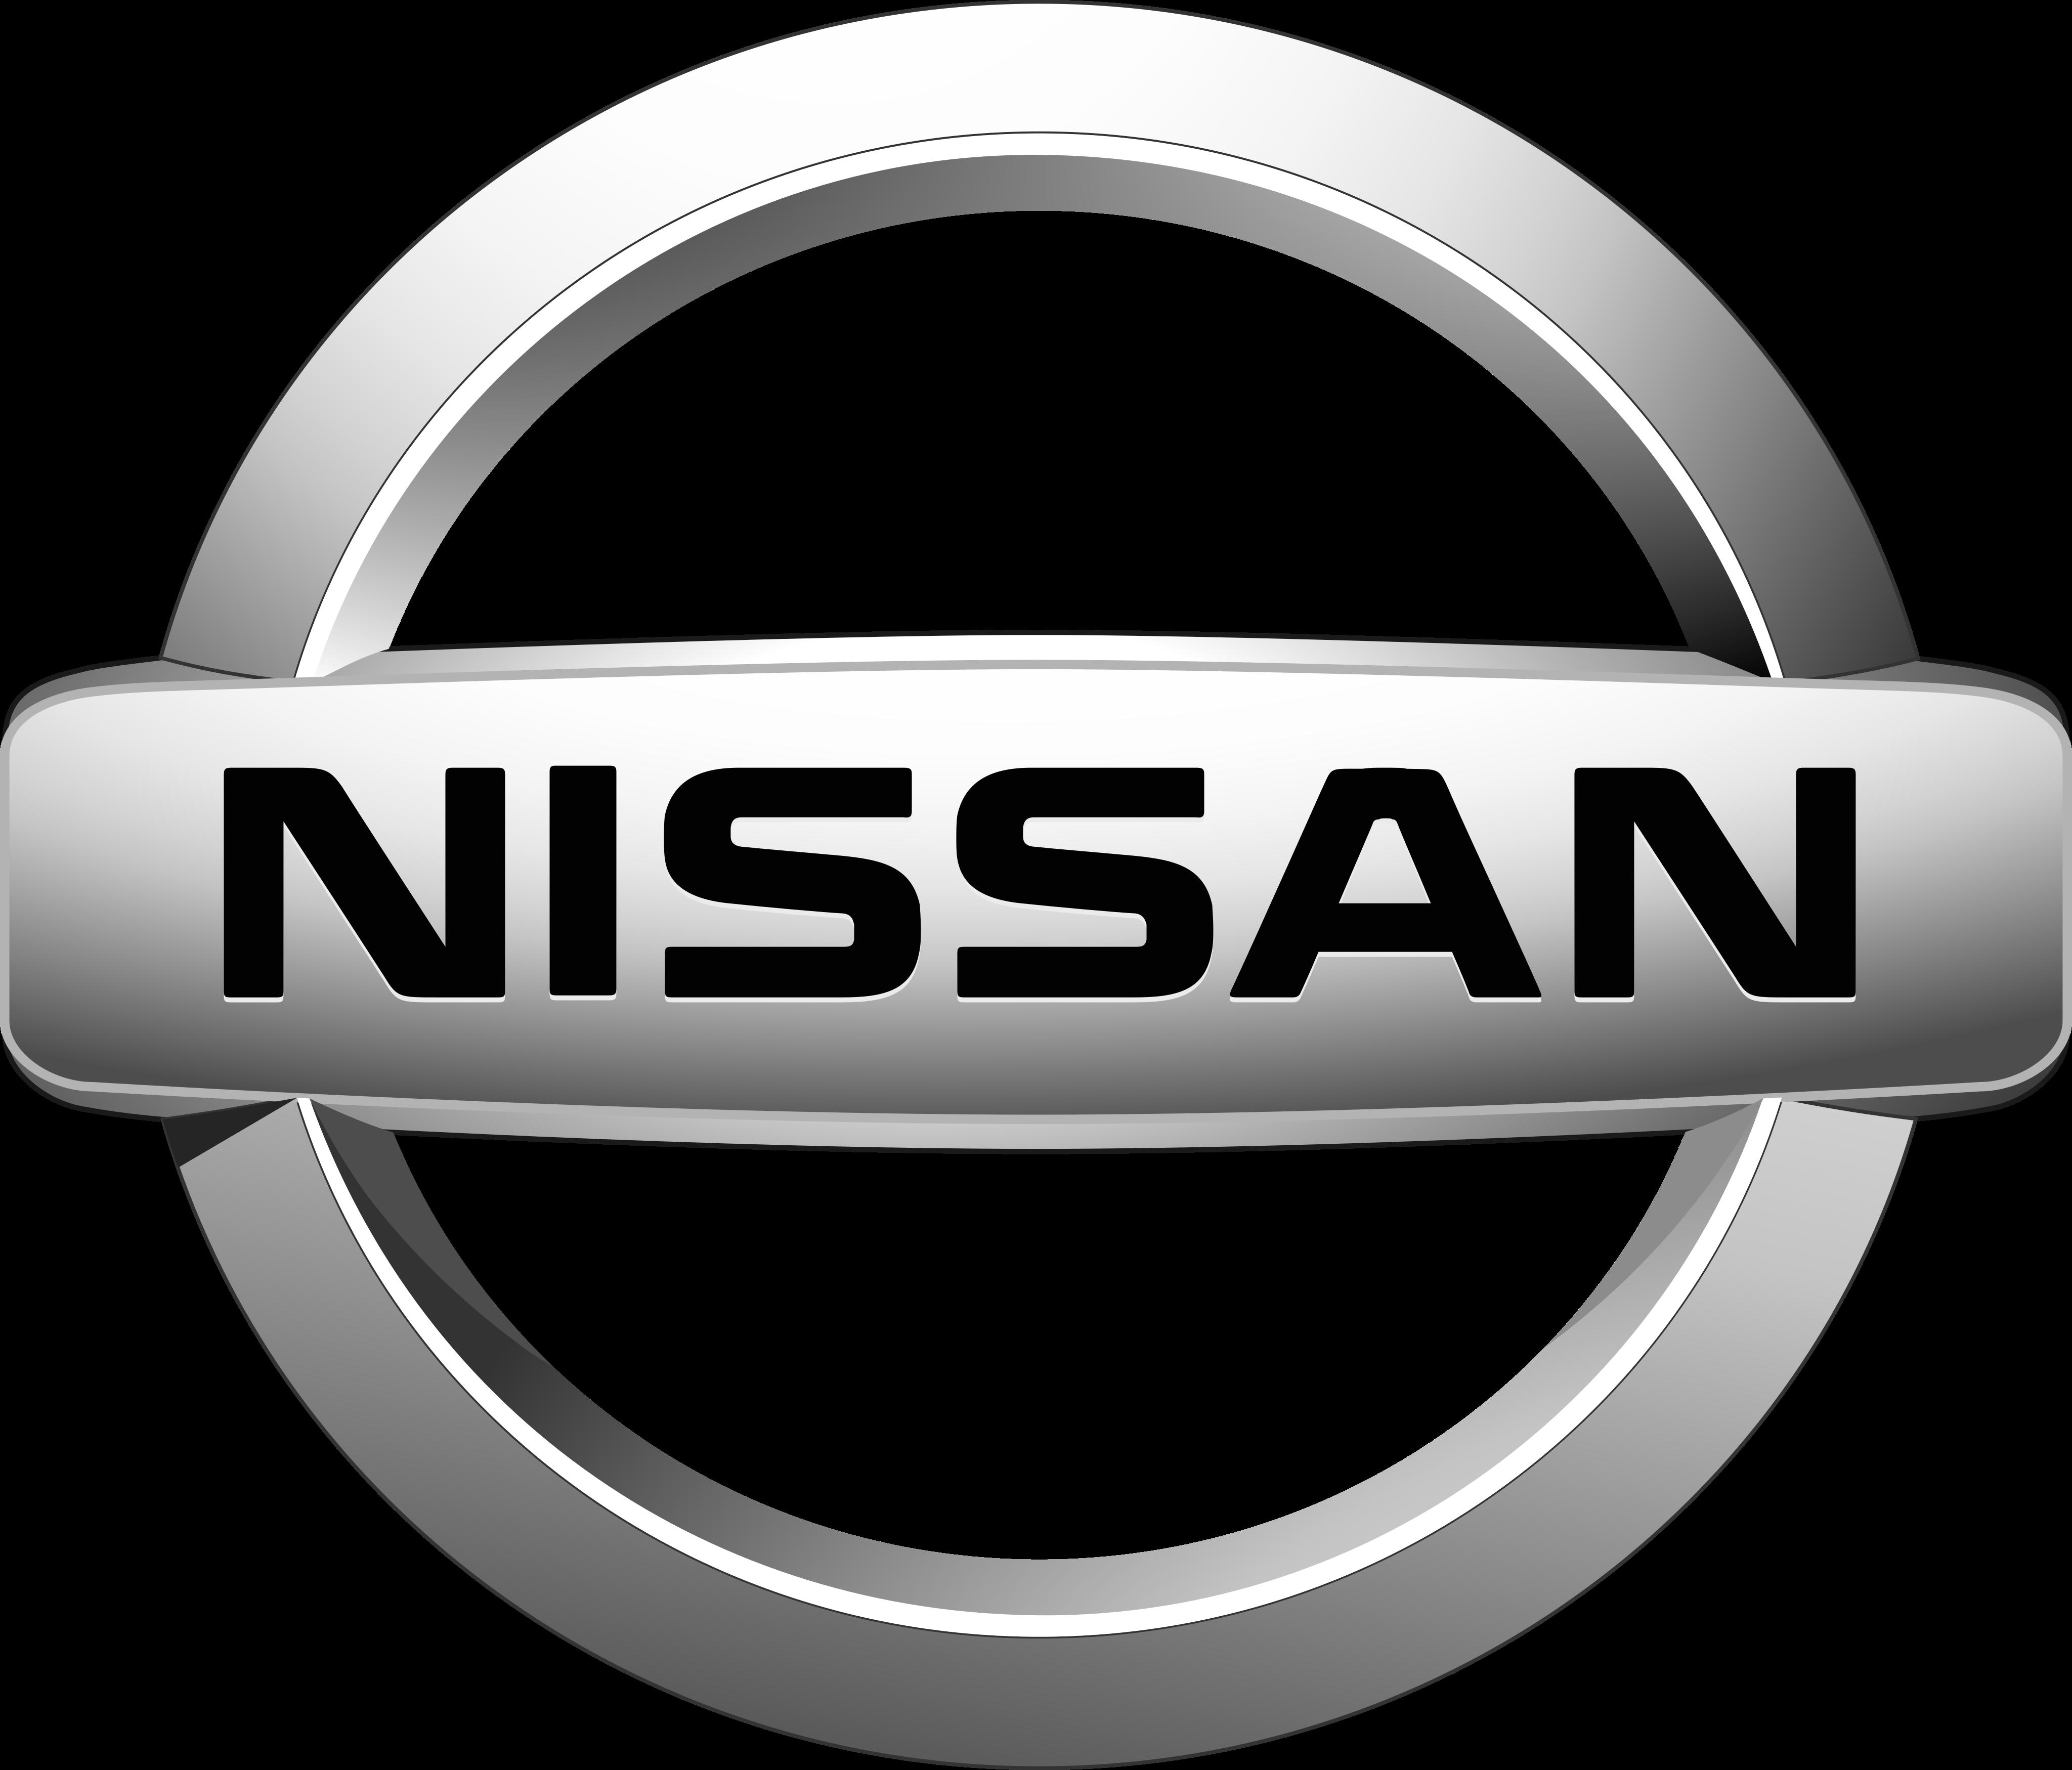 nissan logo 1 - Nissan Logo